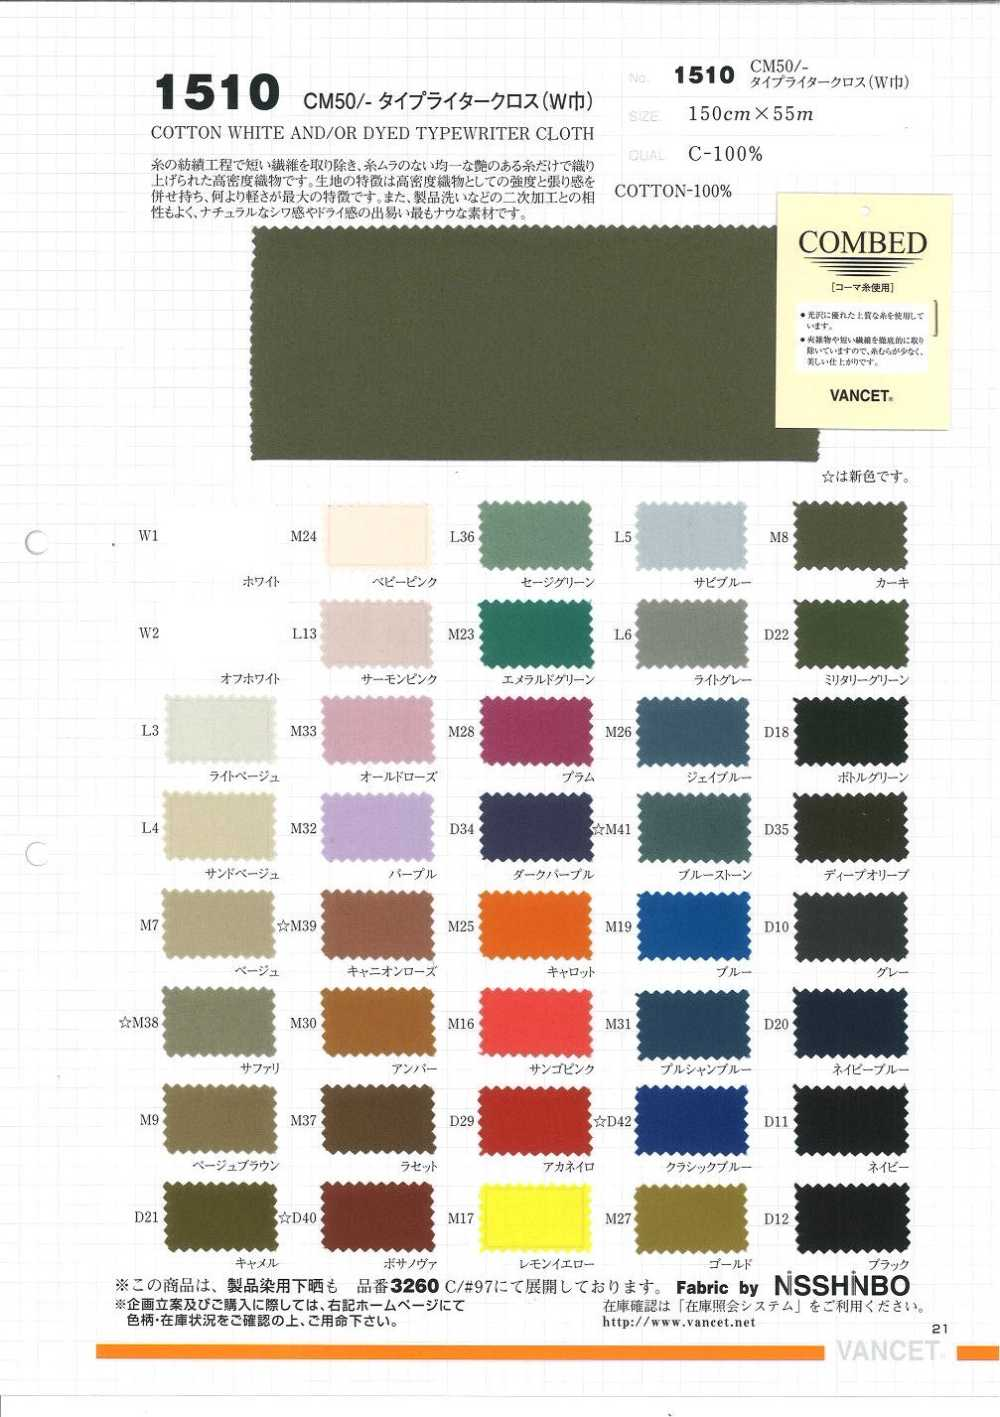 1510 CM50/- タイプライタークロス(W巾)[生地] VANCET/オークラ商事 - ApparelX アパレル資材卸通販